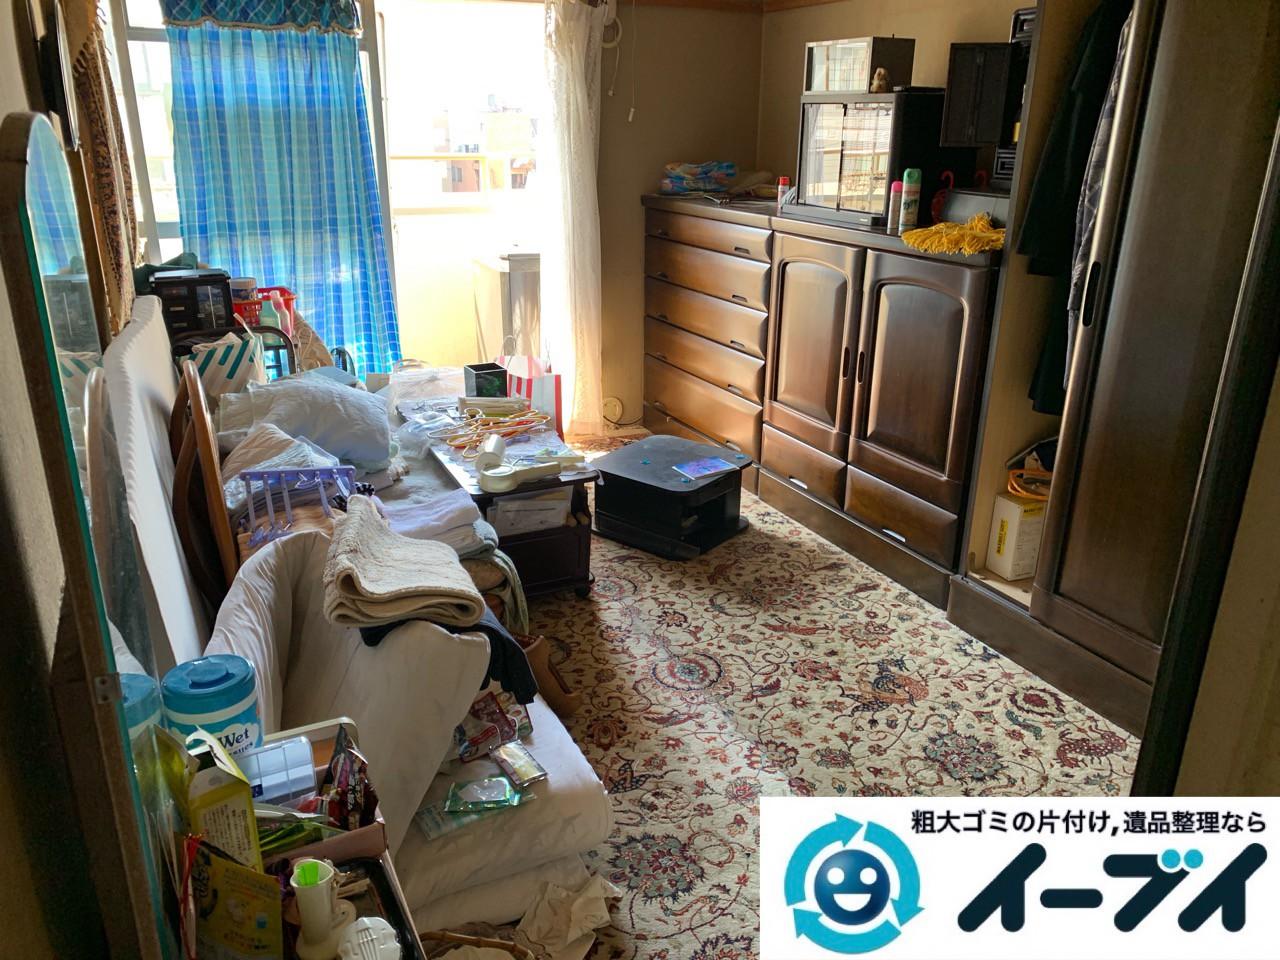 2019年5月8日大阪府枚方市でお部屋の台所の不用品回収作業。写真1